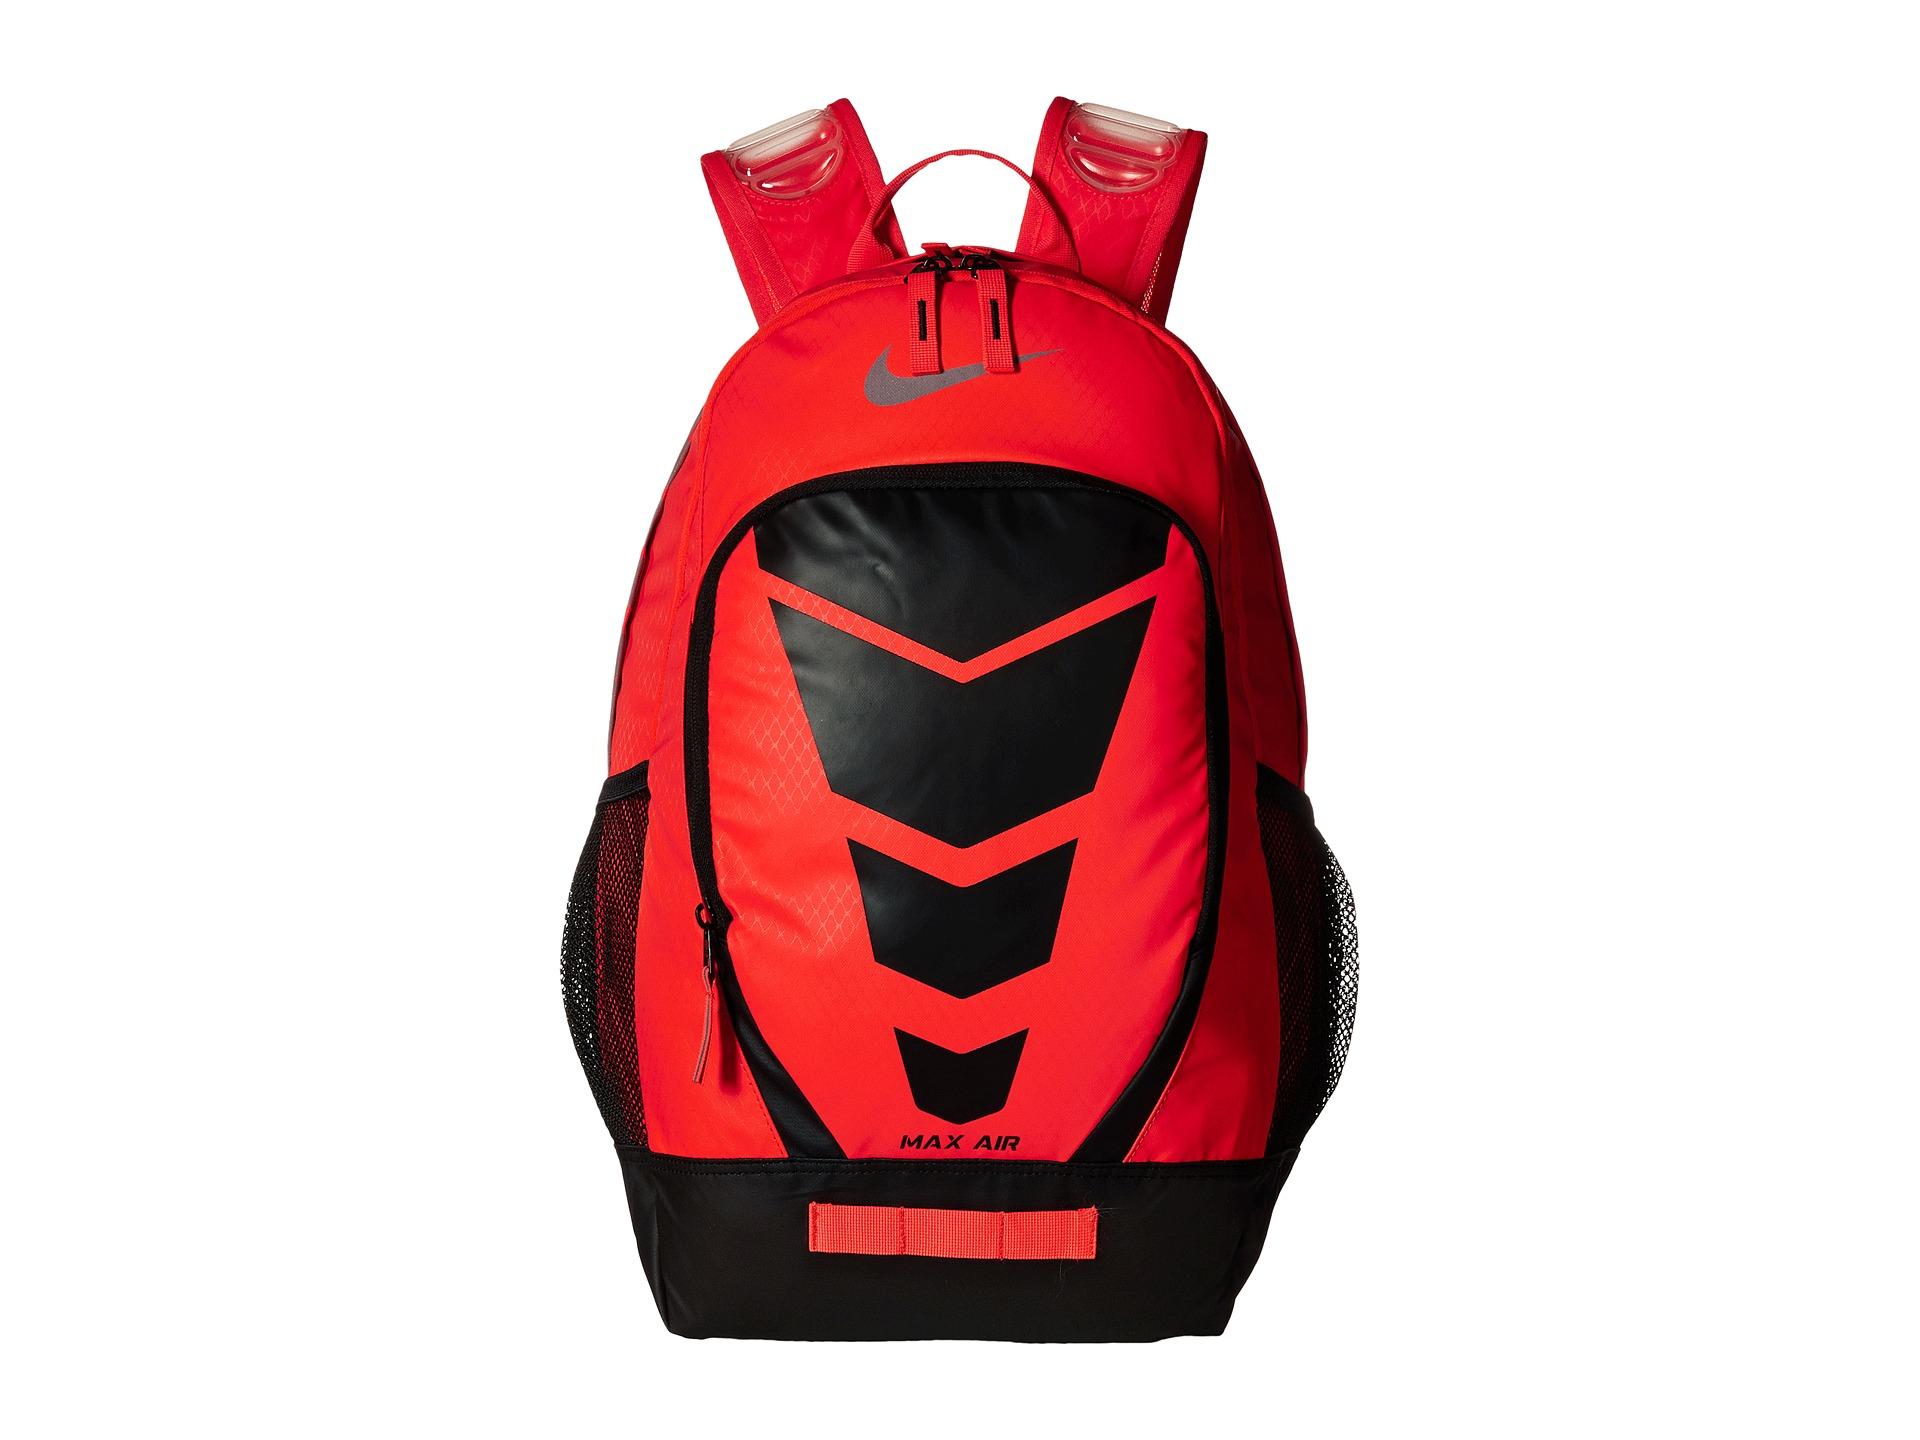 d9f75e01574 Lyst - Nike Max Air Vapor Backpack in Black